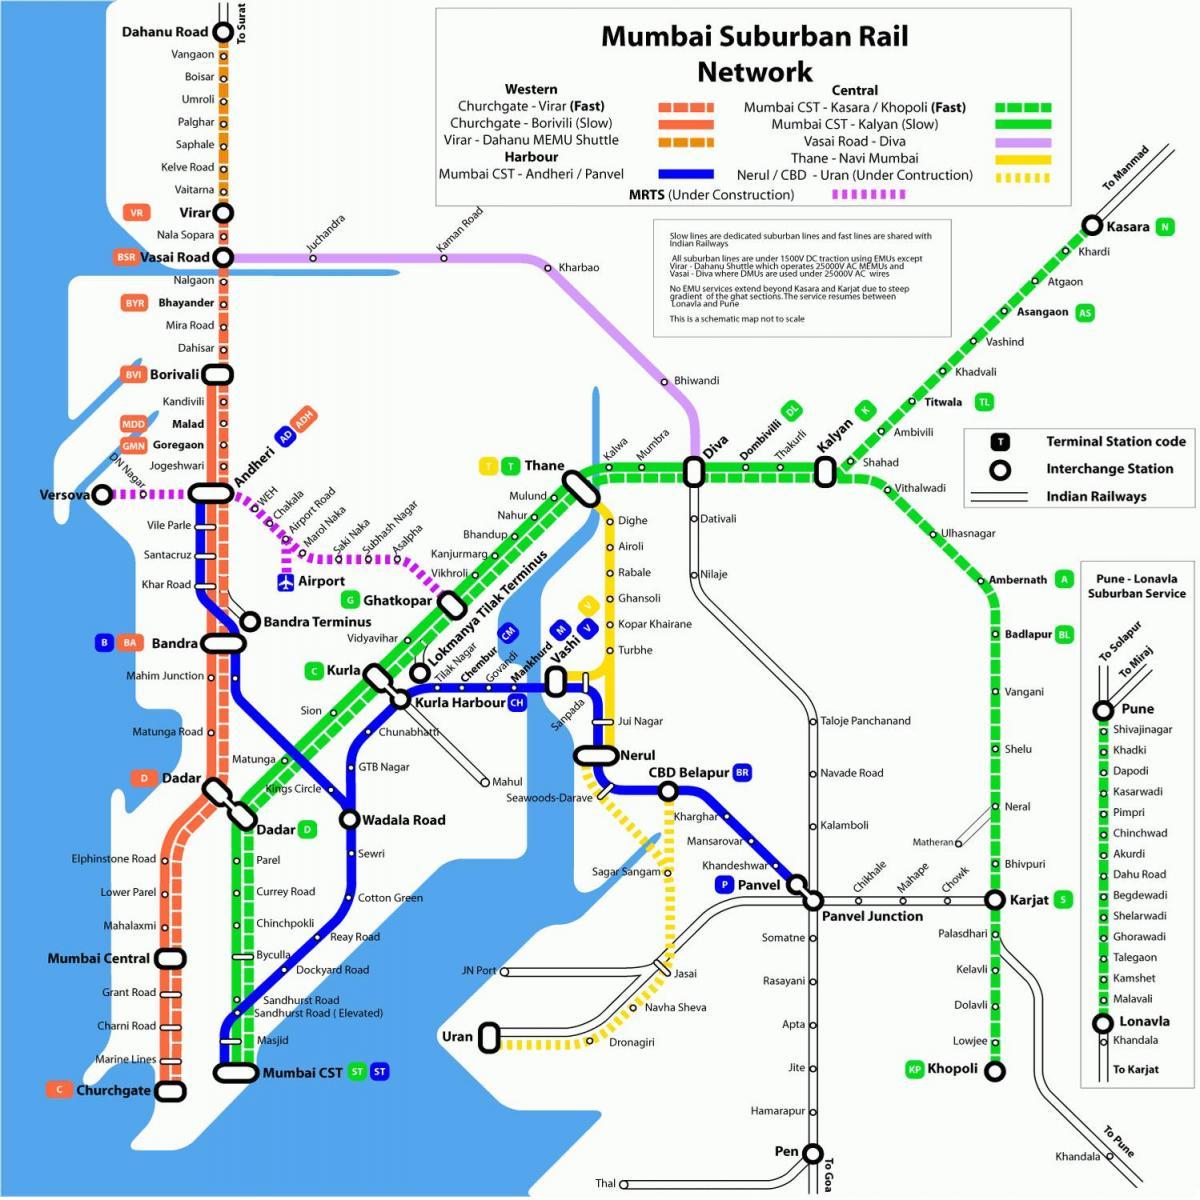 Maharashtra Railway Map Mumbai local rail map   Mumbai local railway map (Maharashtra   India) Maharashtra Railway Map